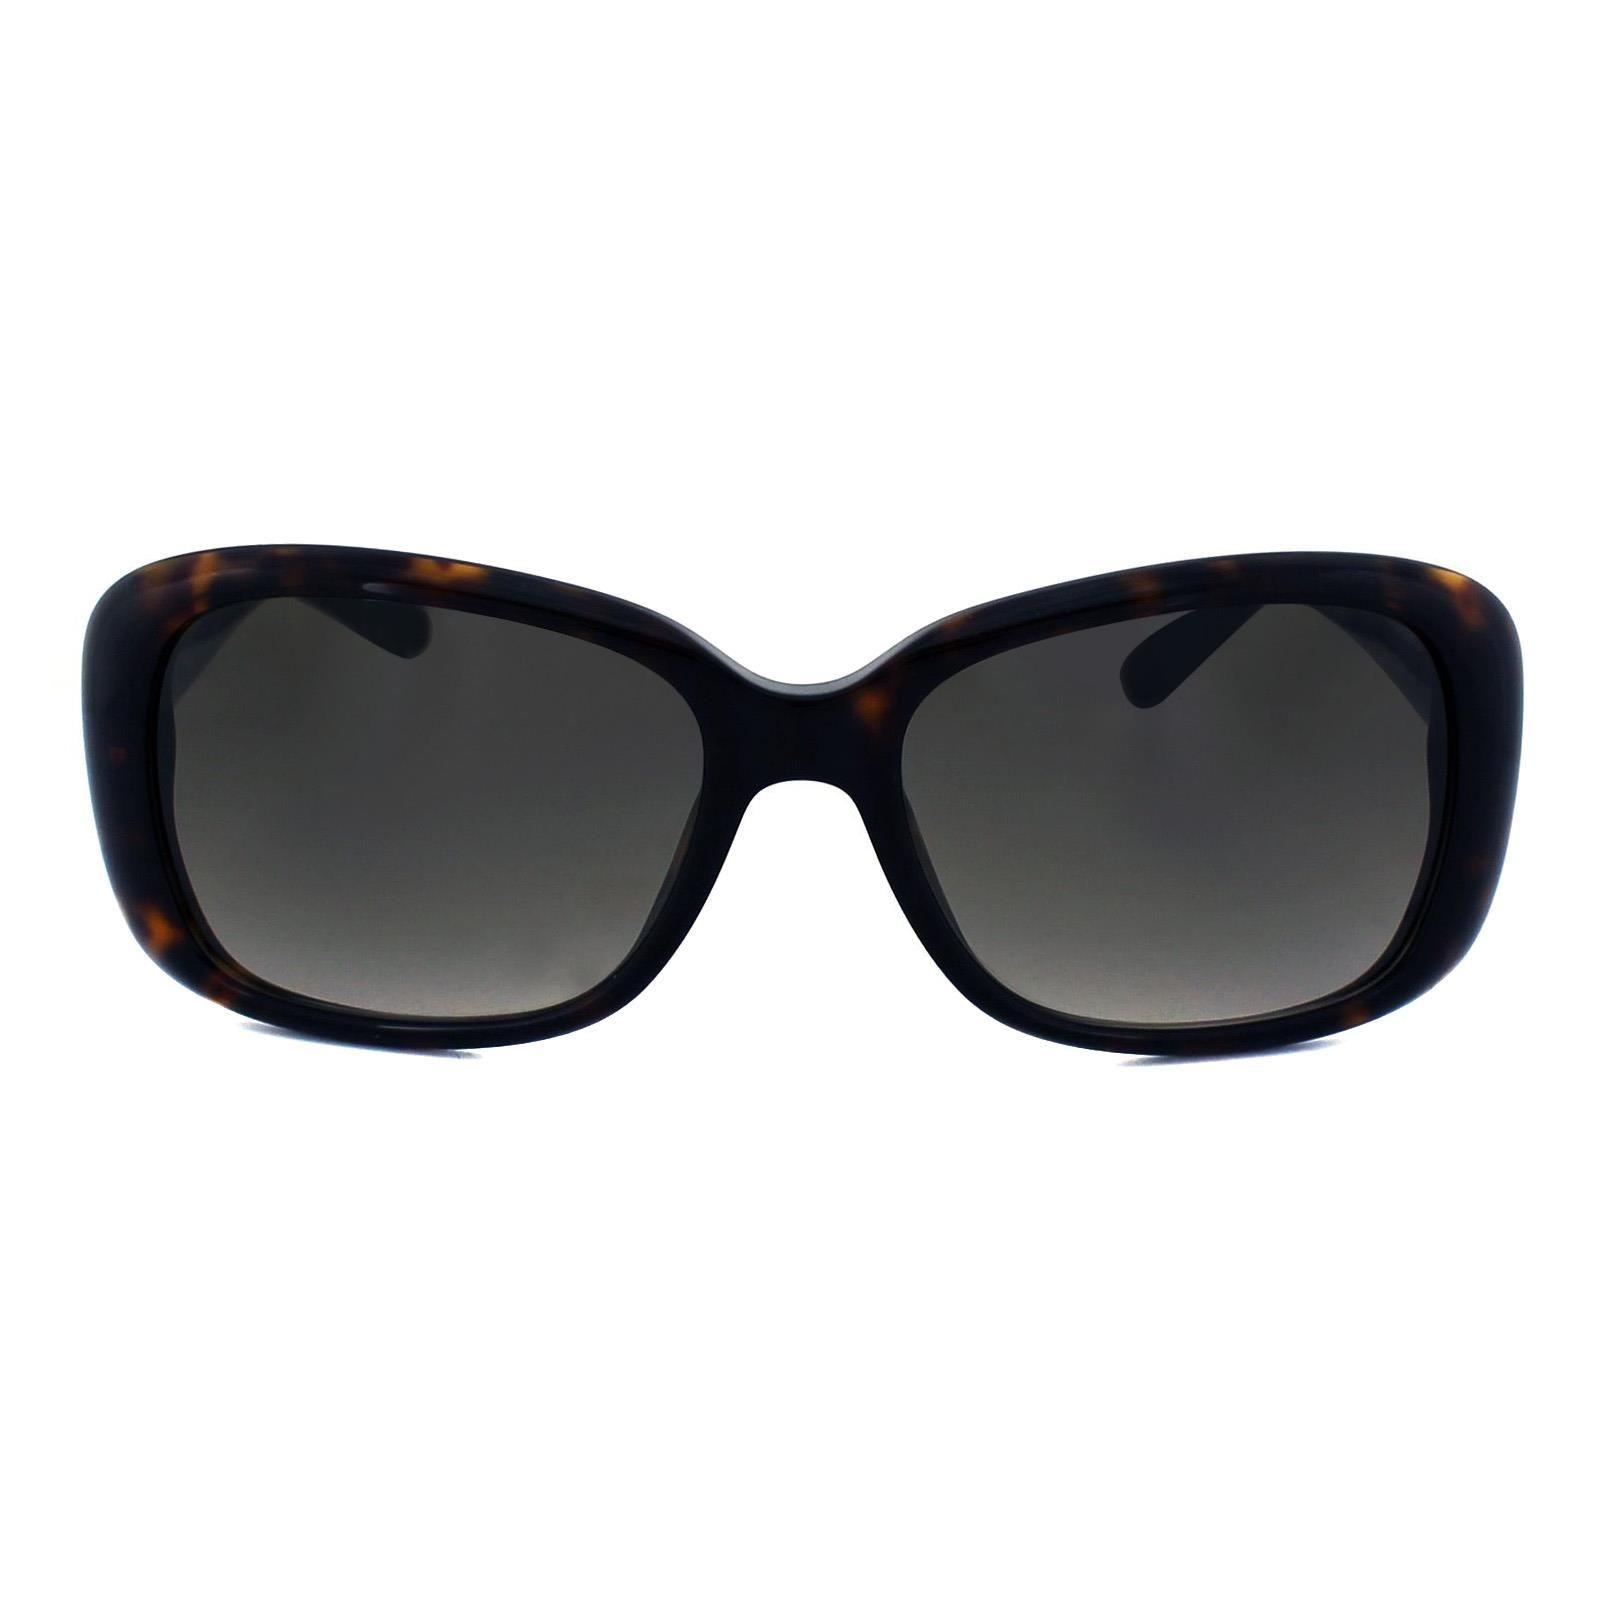 Boss Sunglasses 0613 5JO HA Havana Brown Brown Gradient